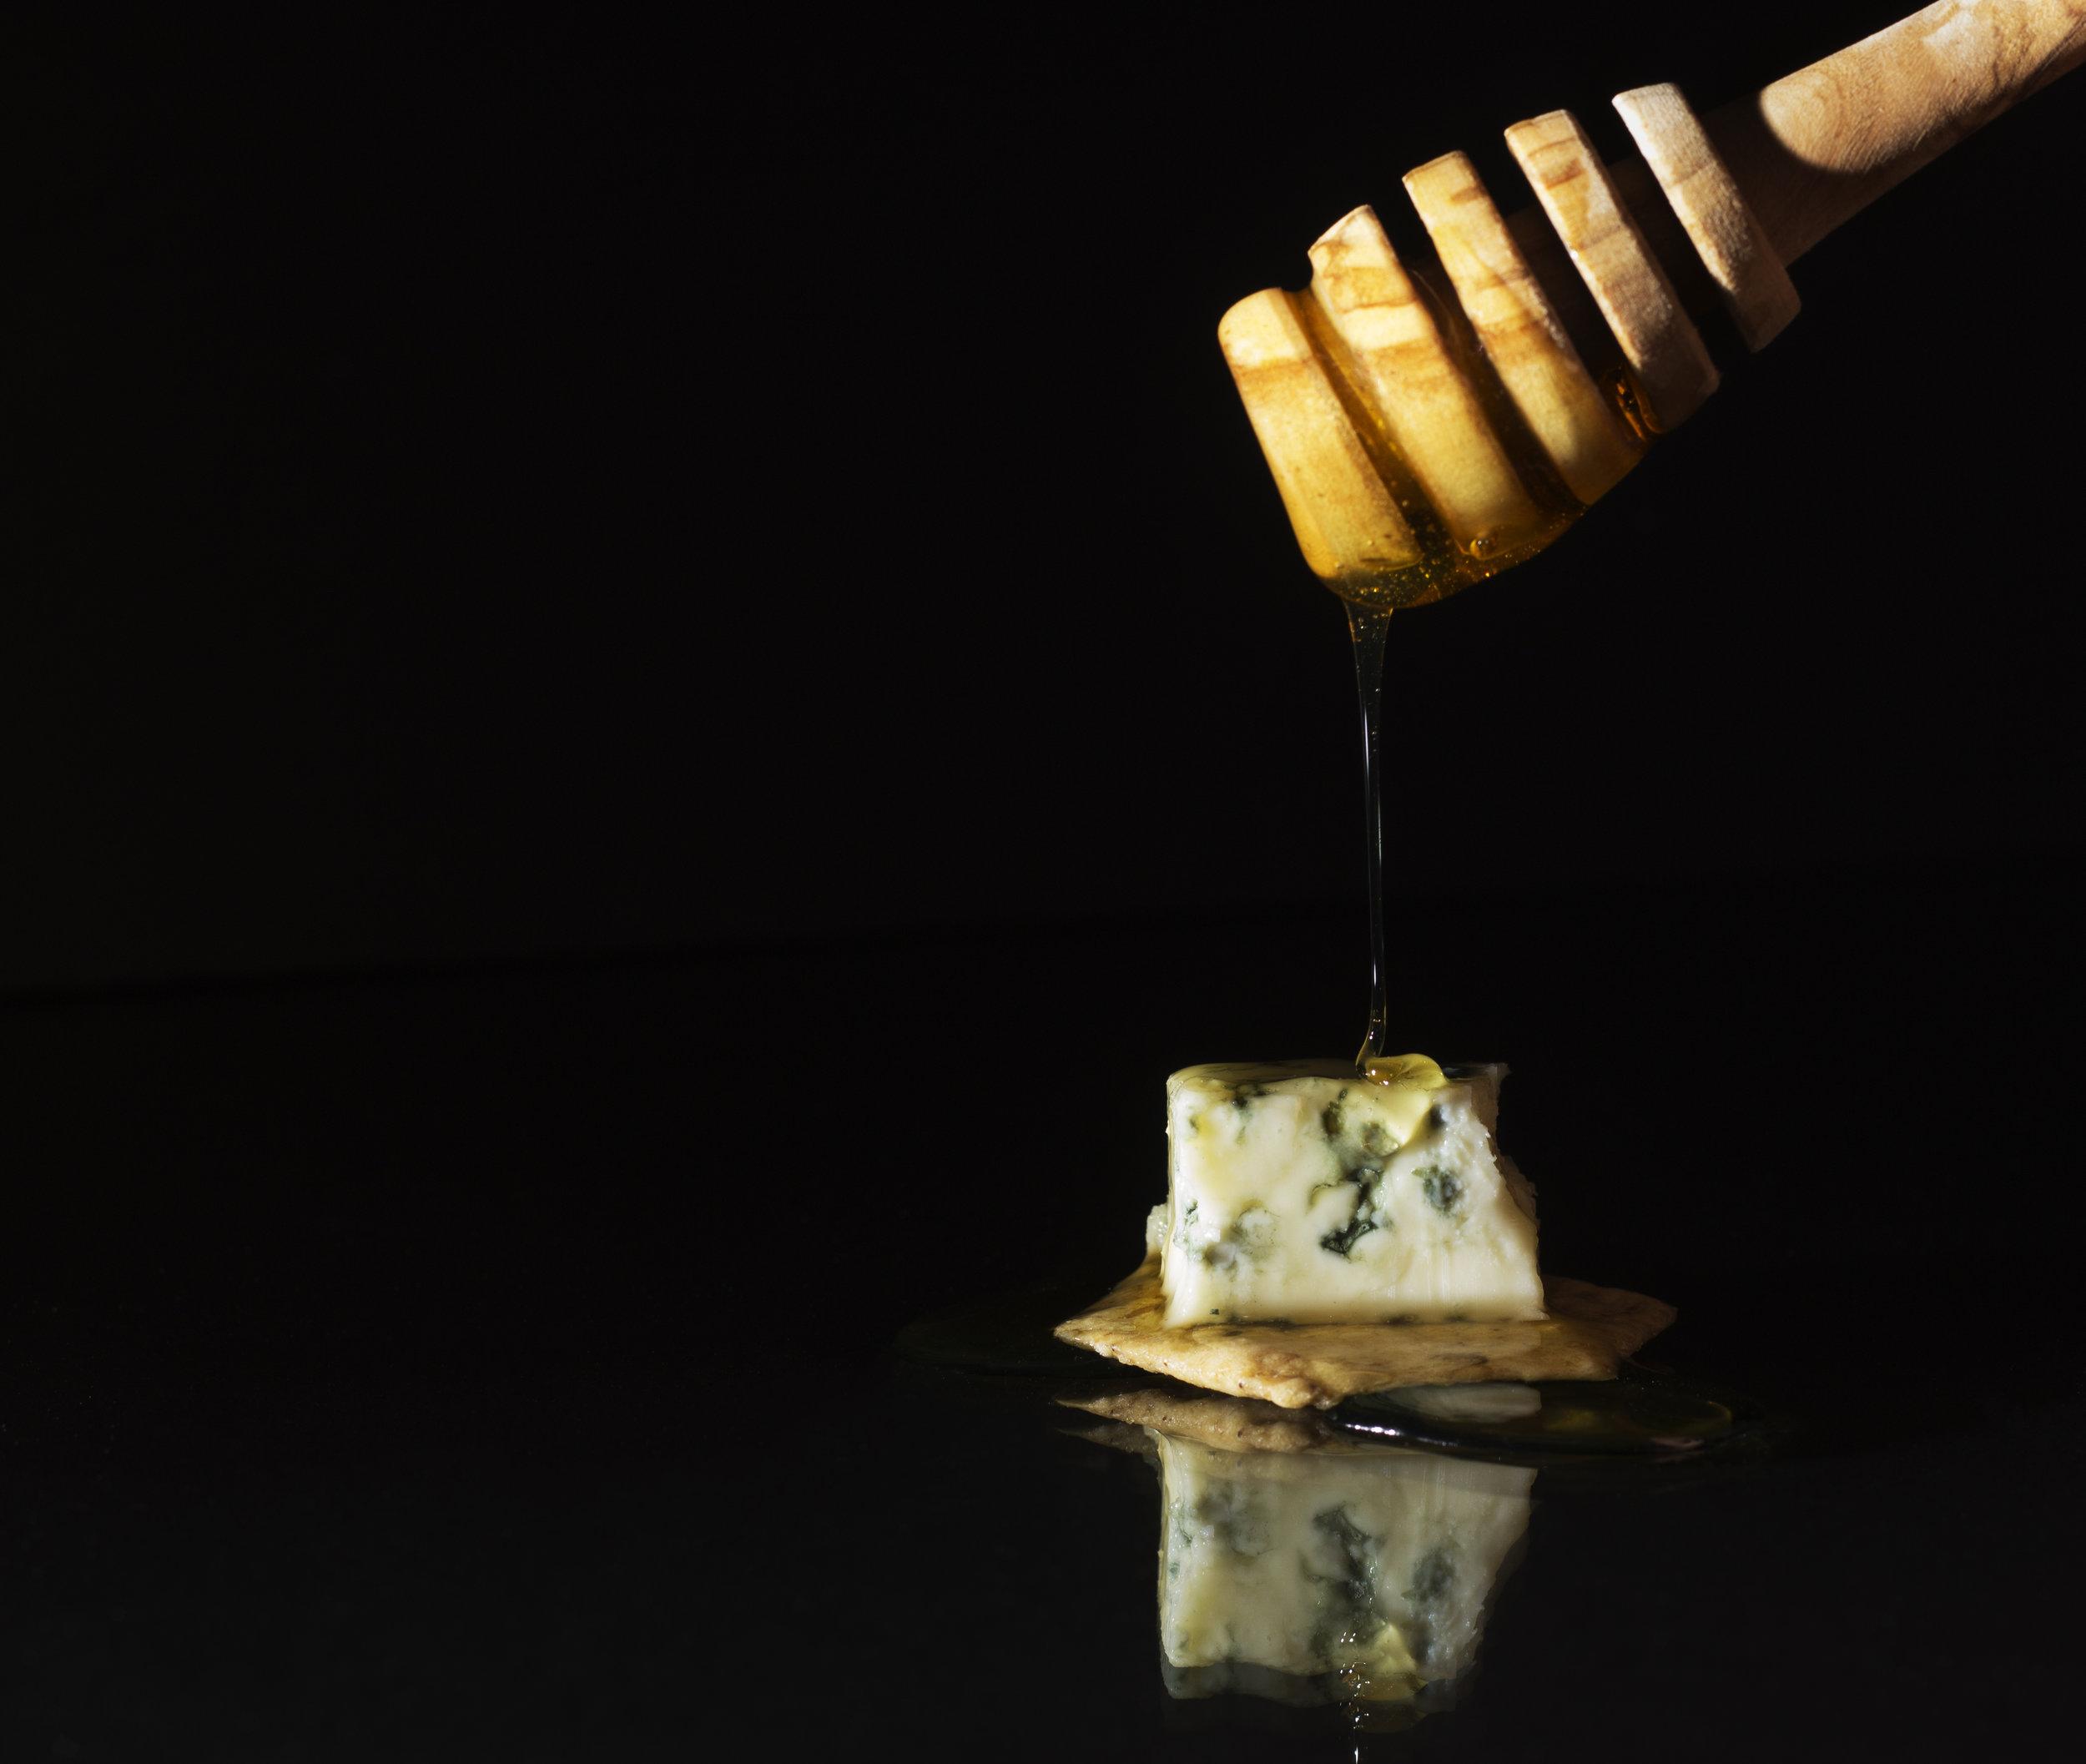 001-MSL Honey On Blue Cheese No2-8181.jpg